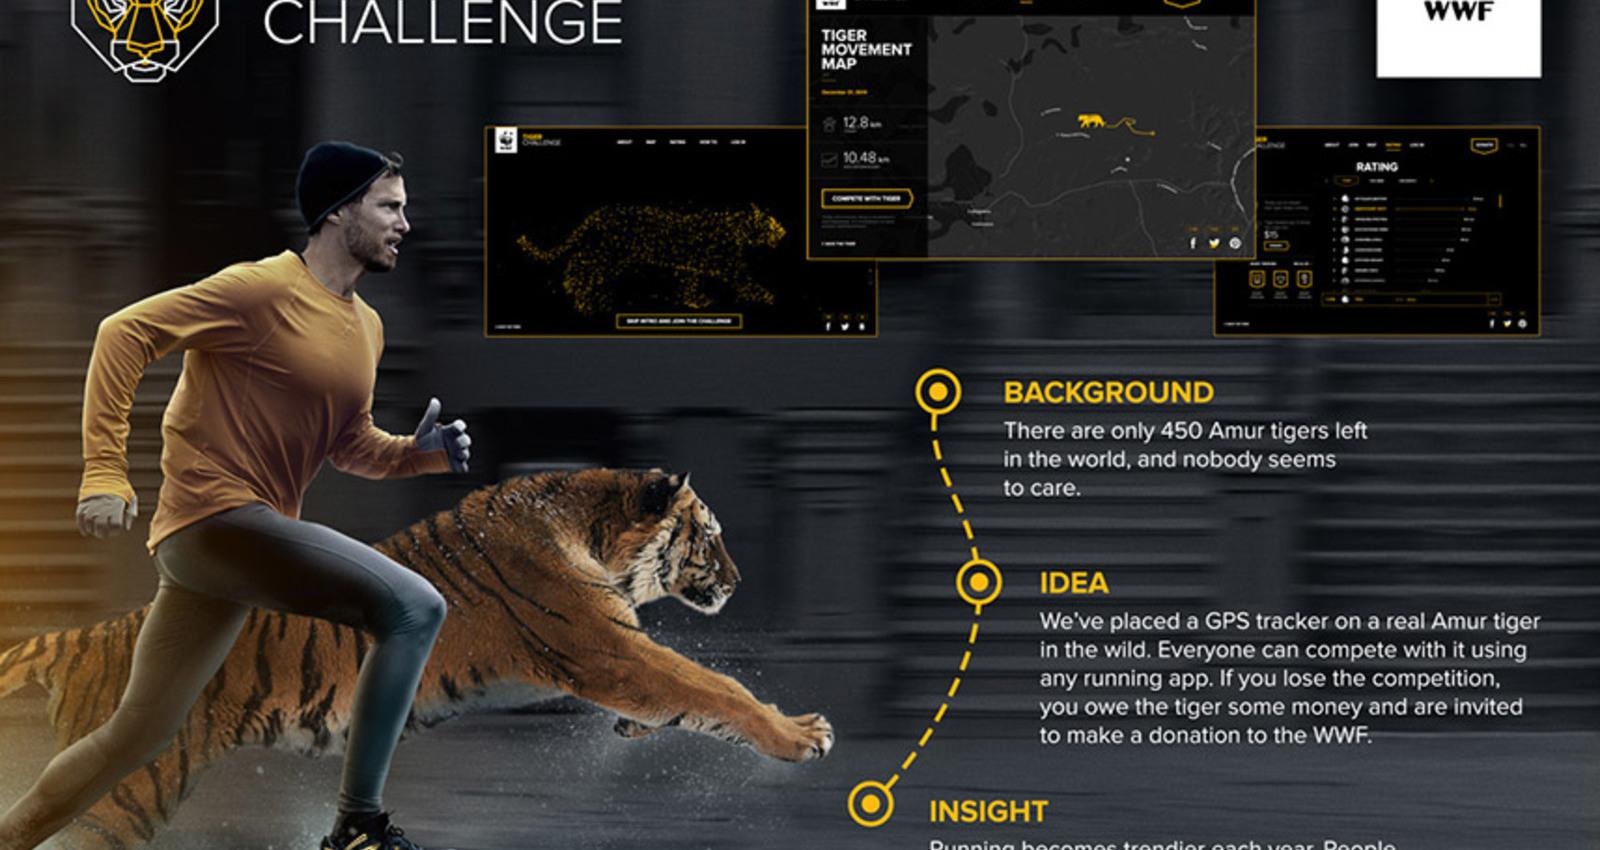 Tiger Challenge